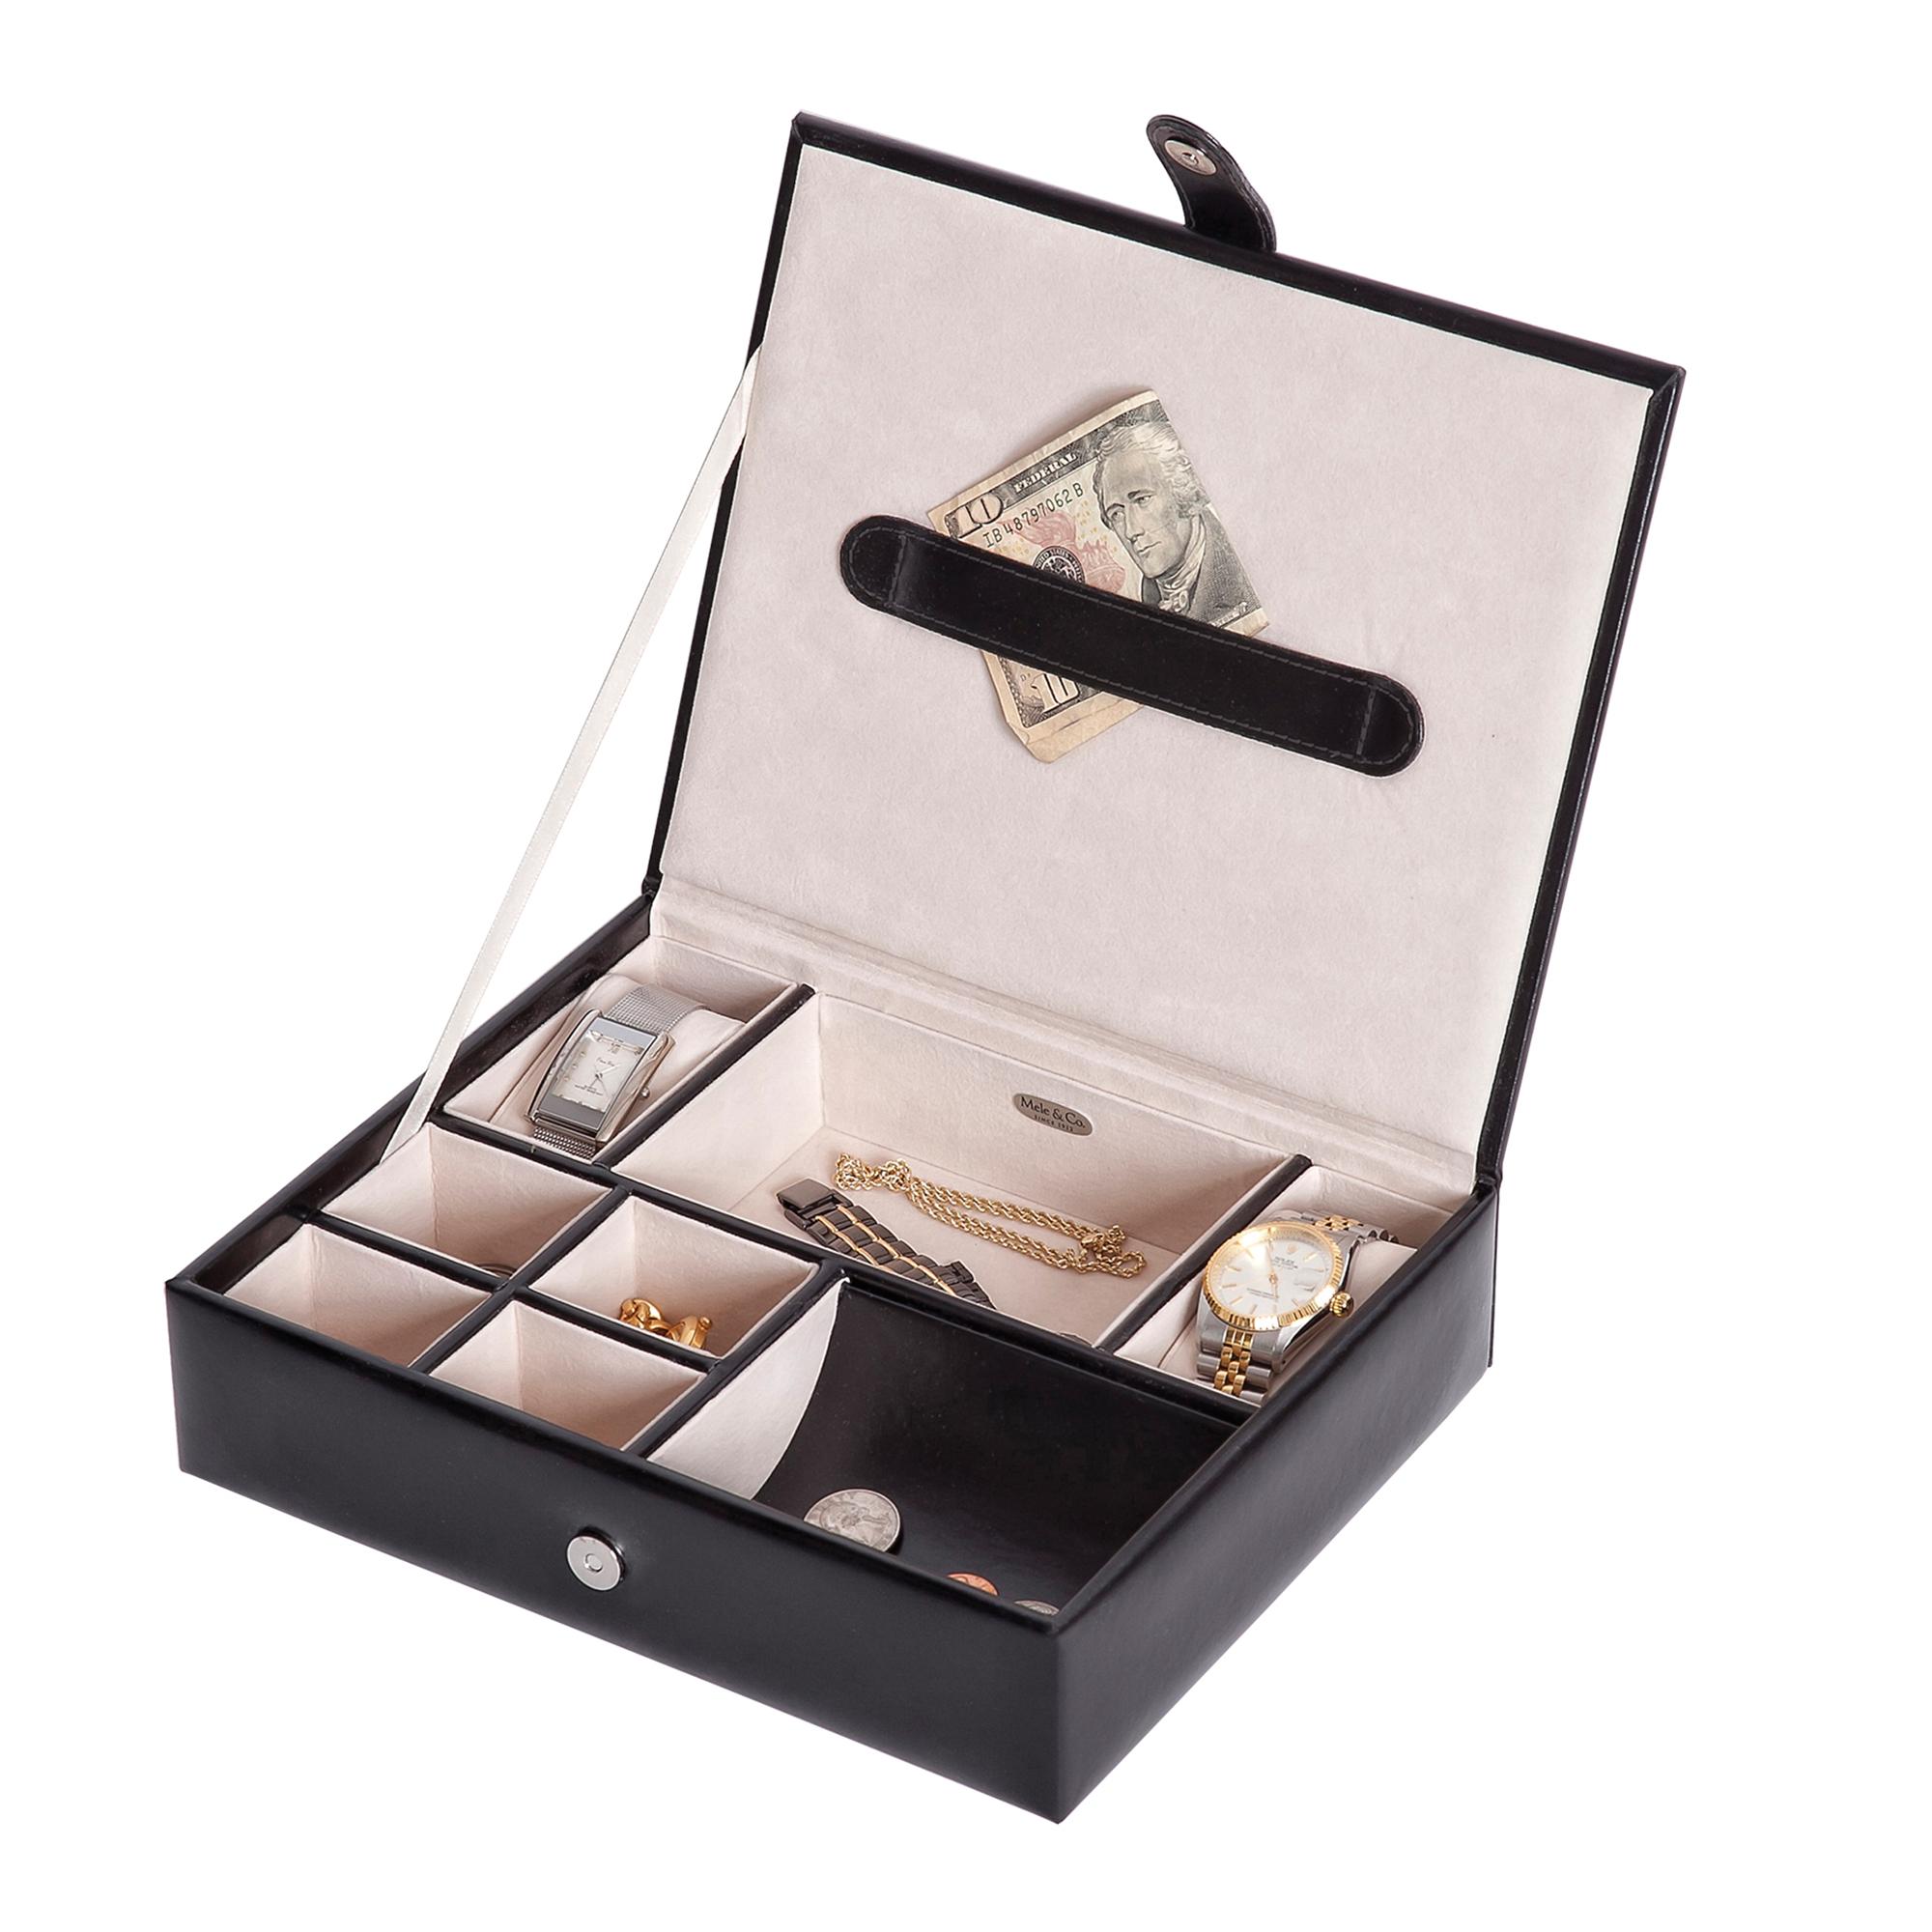 Mele Co Plush Fabric fashion jewelry box Black